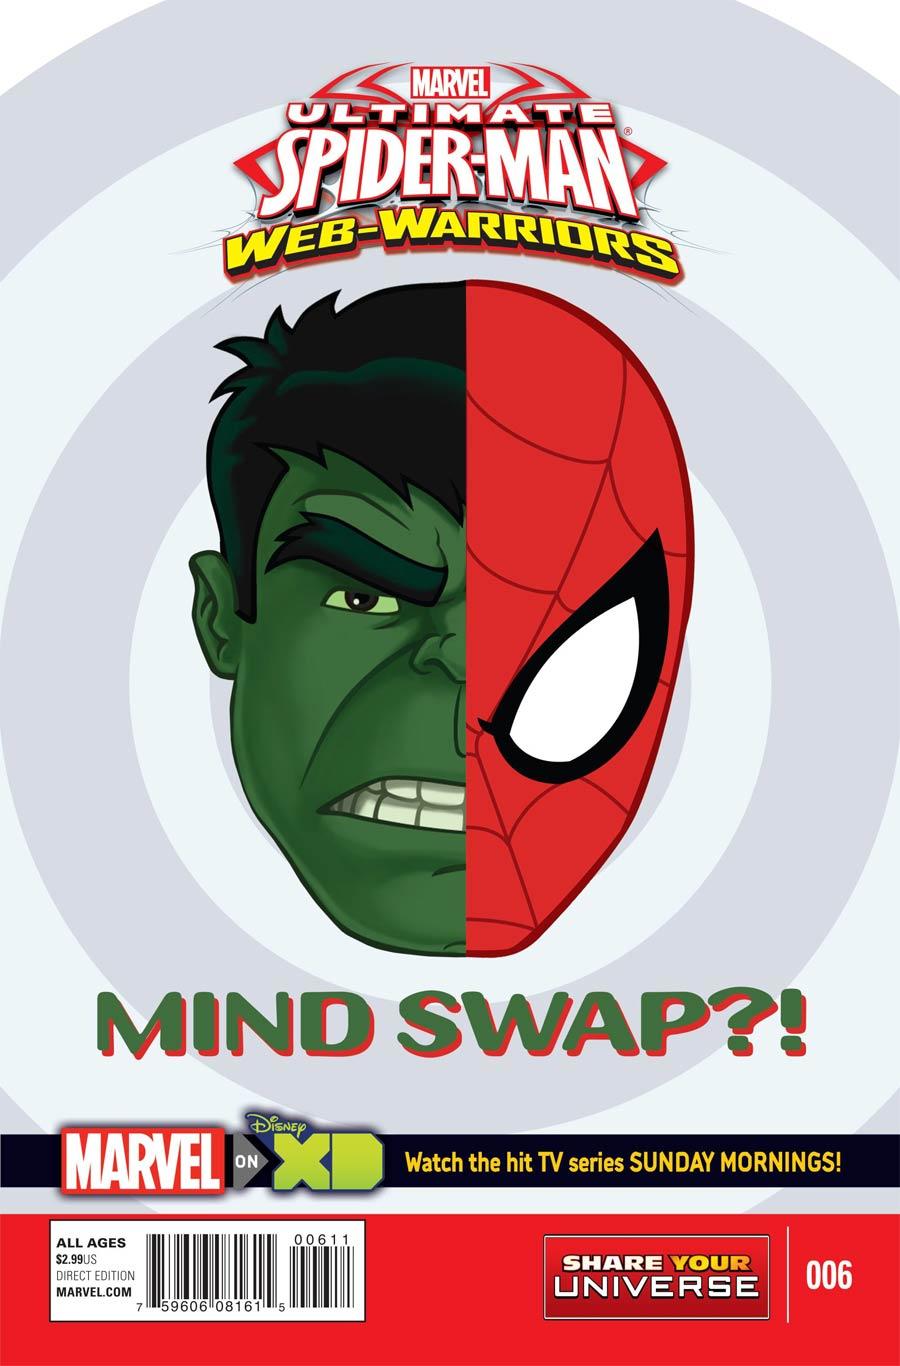 Marvel Universe Ultimate Spider-Man Web Warriors #6